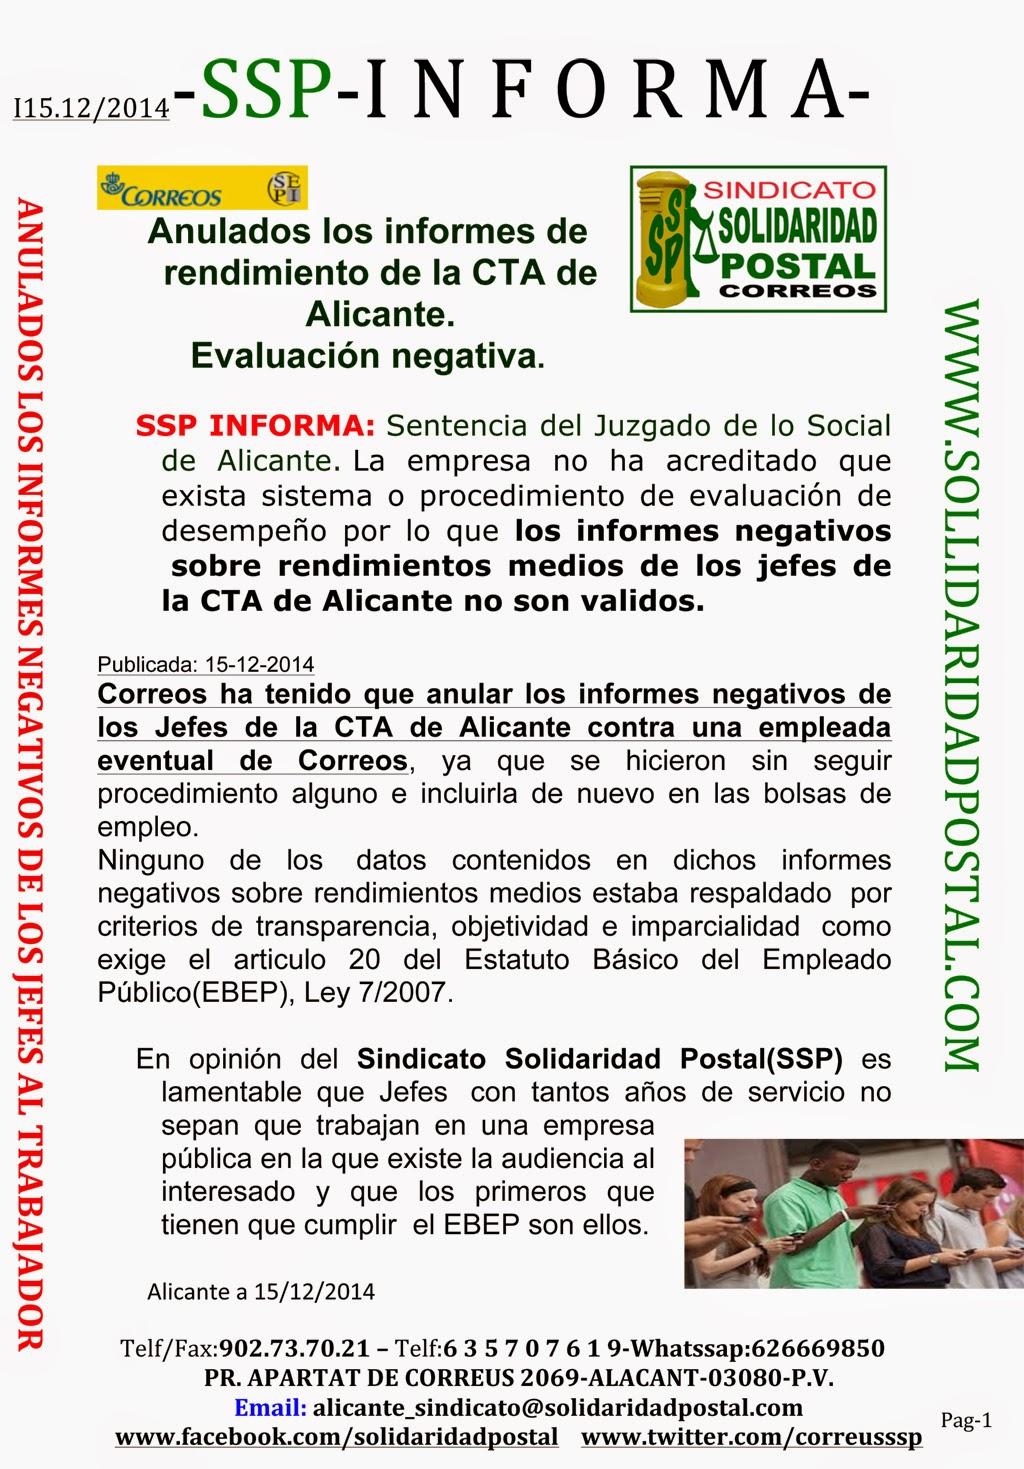 15/12/2014-SOLIDARIDADPOSTAL.COM